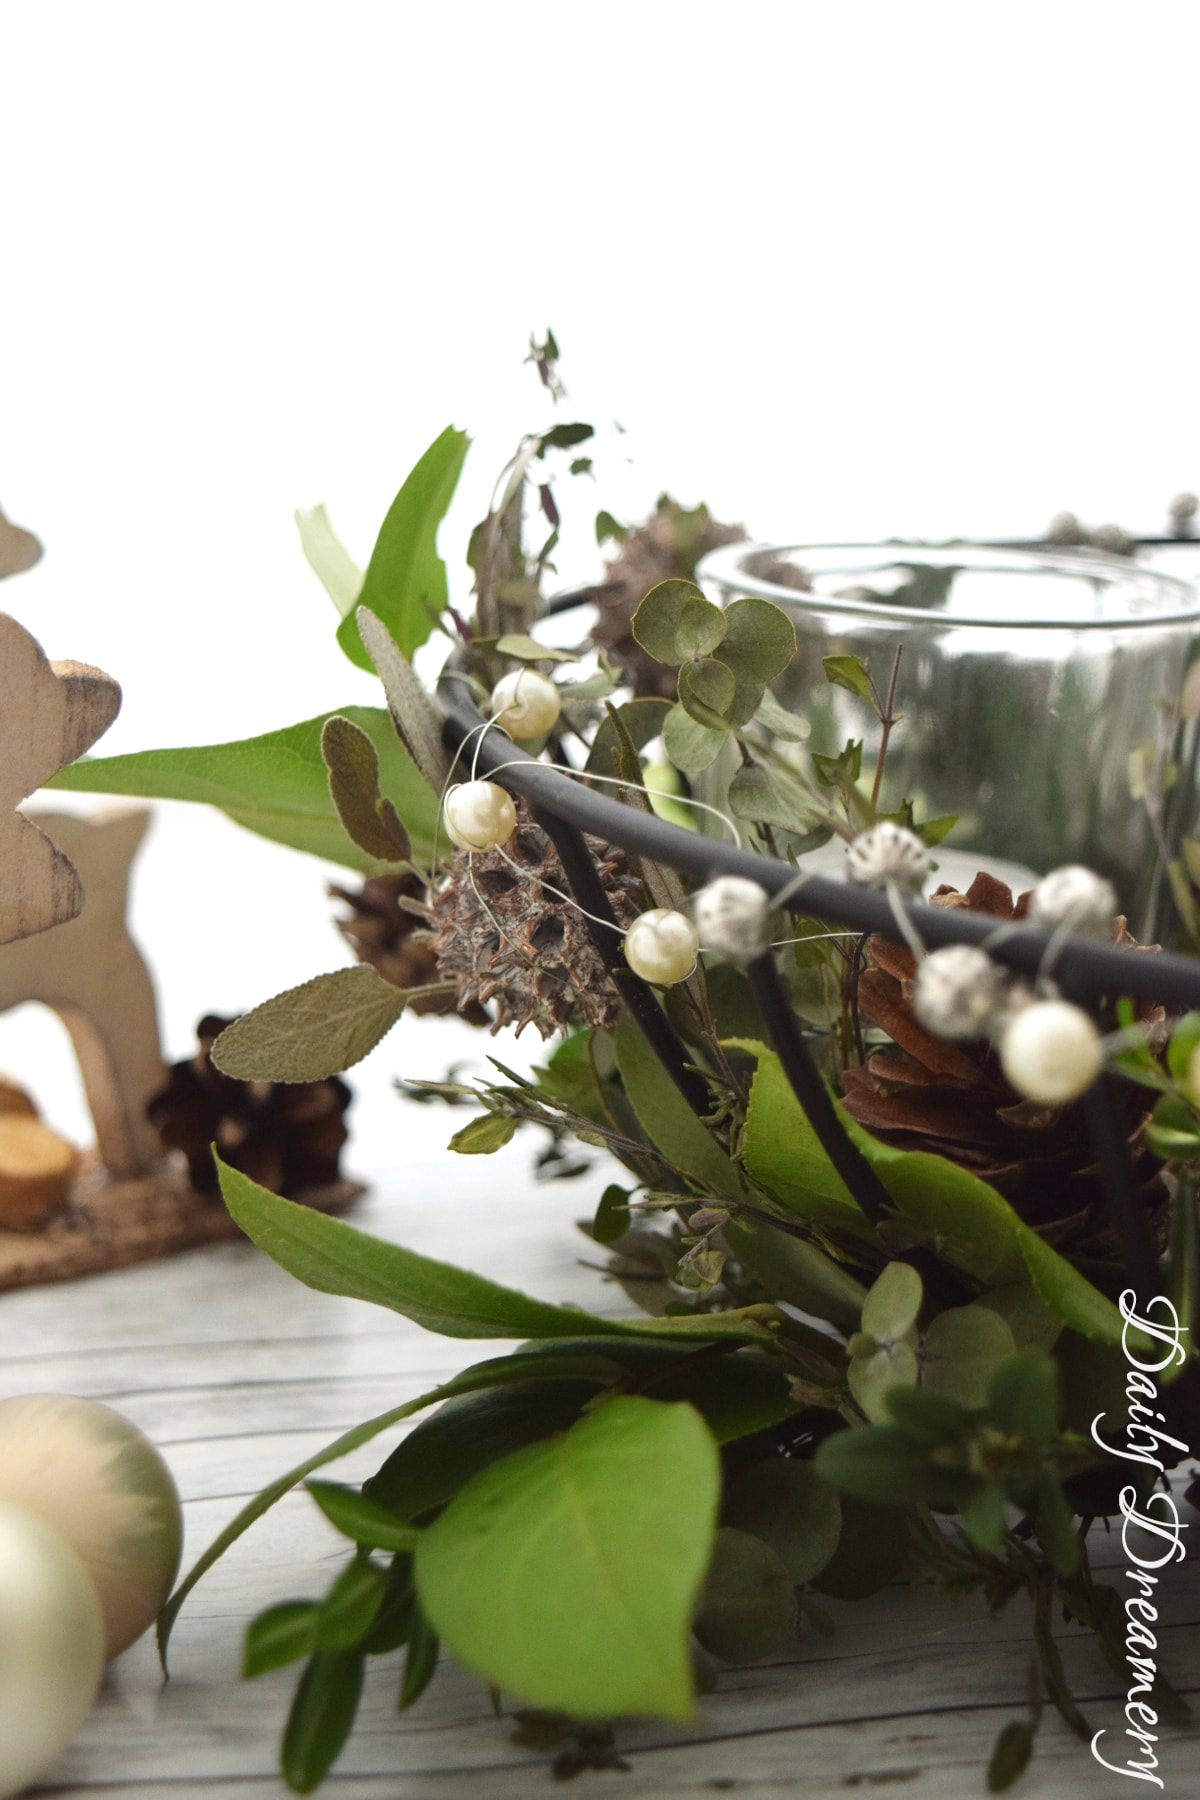 Adventskranz mit Kräutern